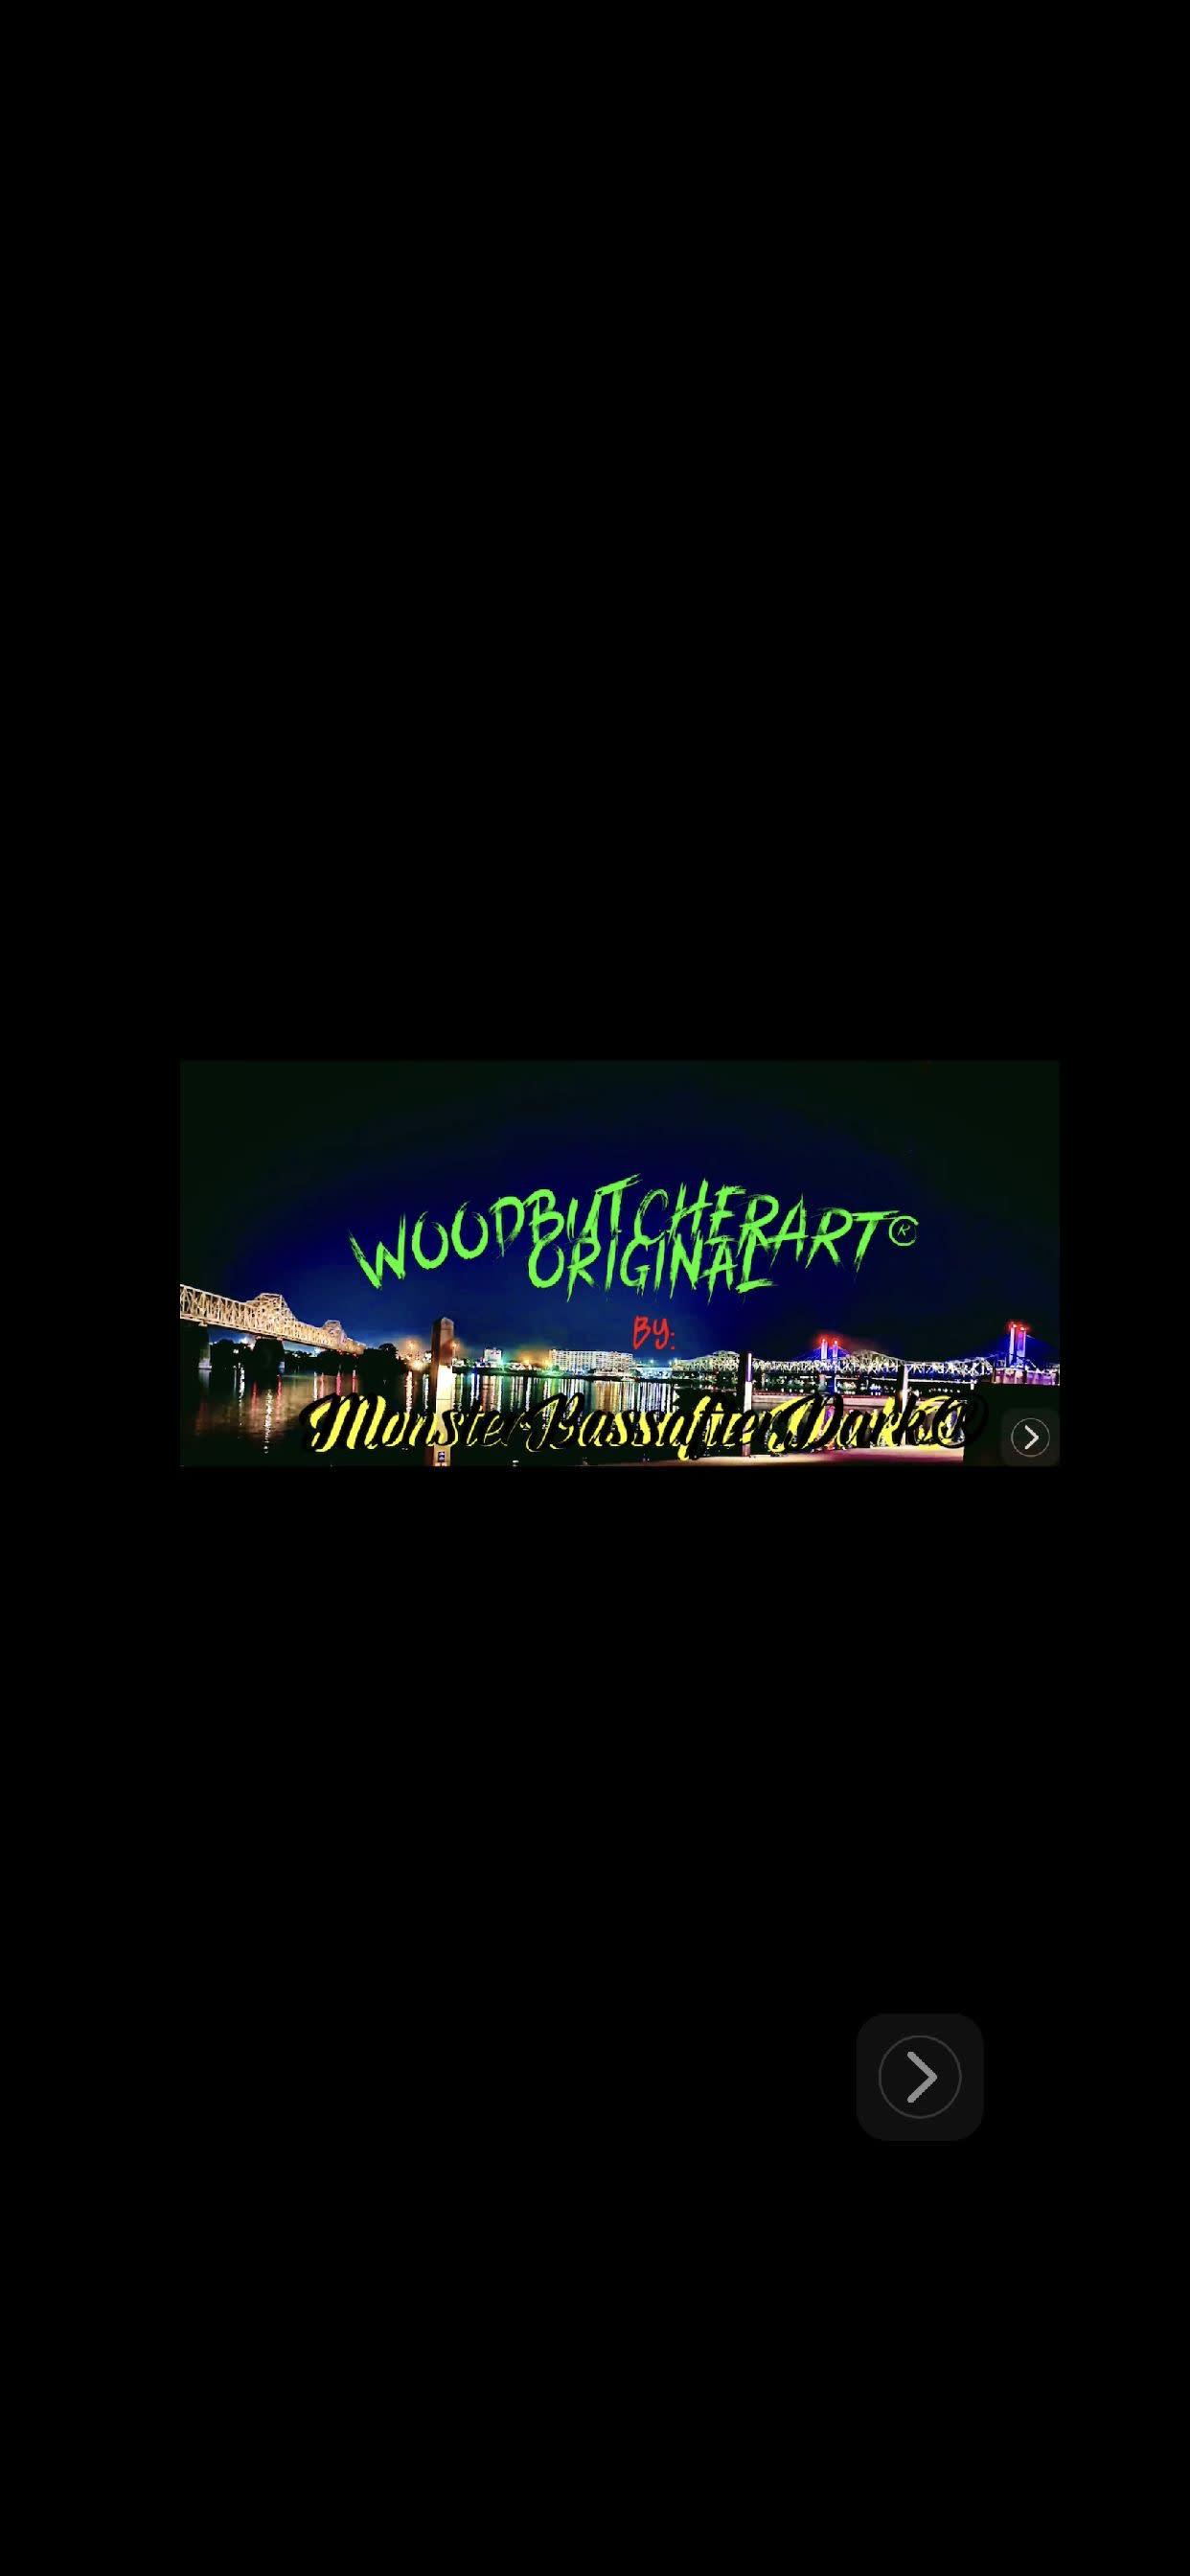 WOODBUTCHERART® ORIGINAL